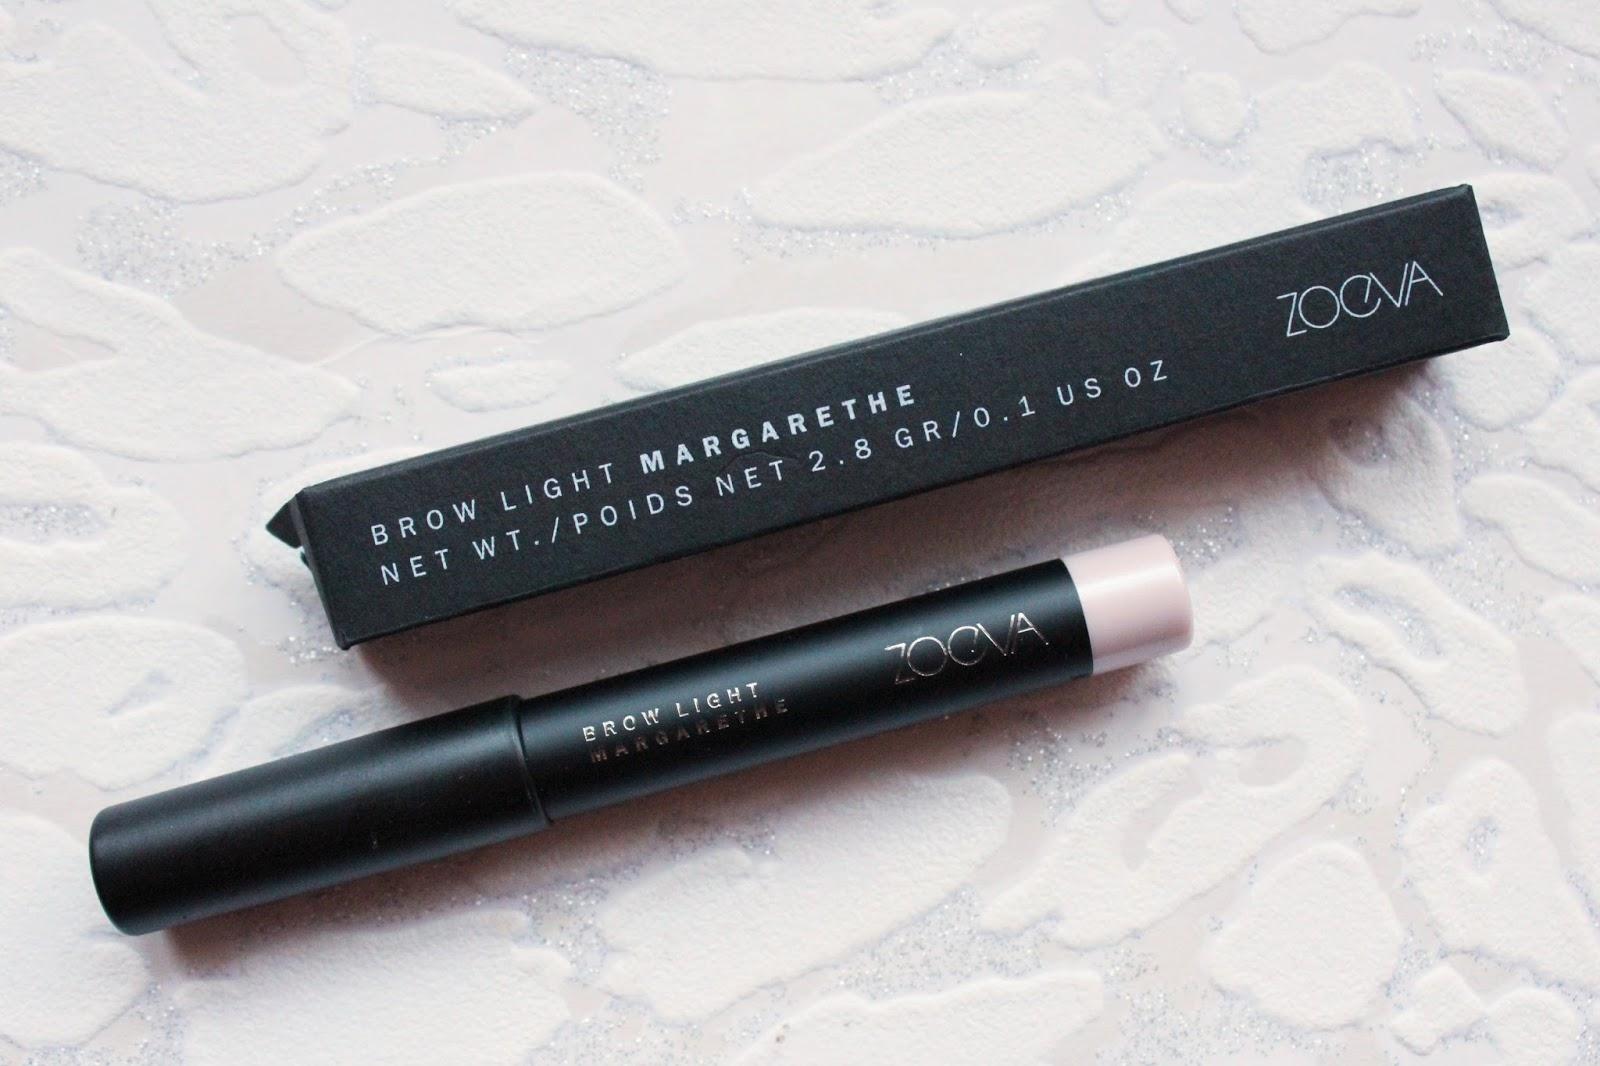 NEW Zoeva Brow Products & Mascara